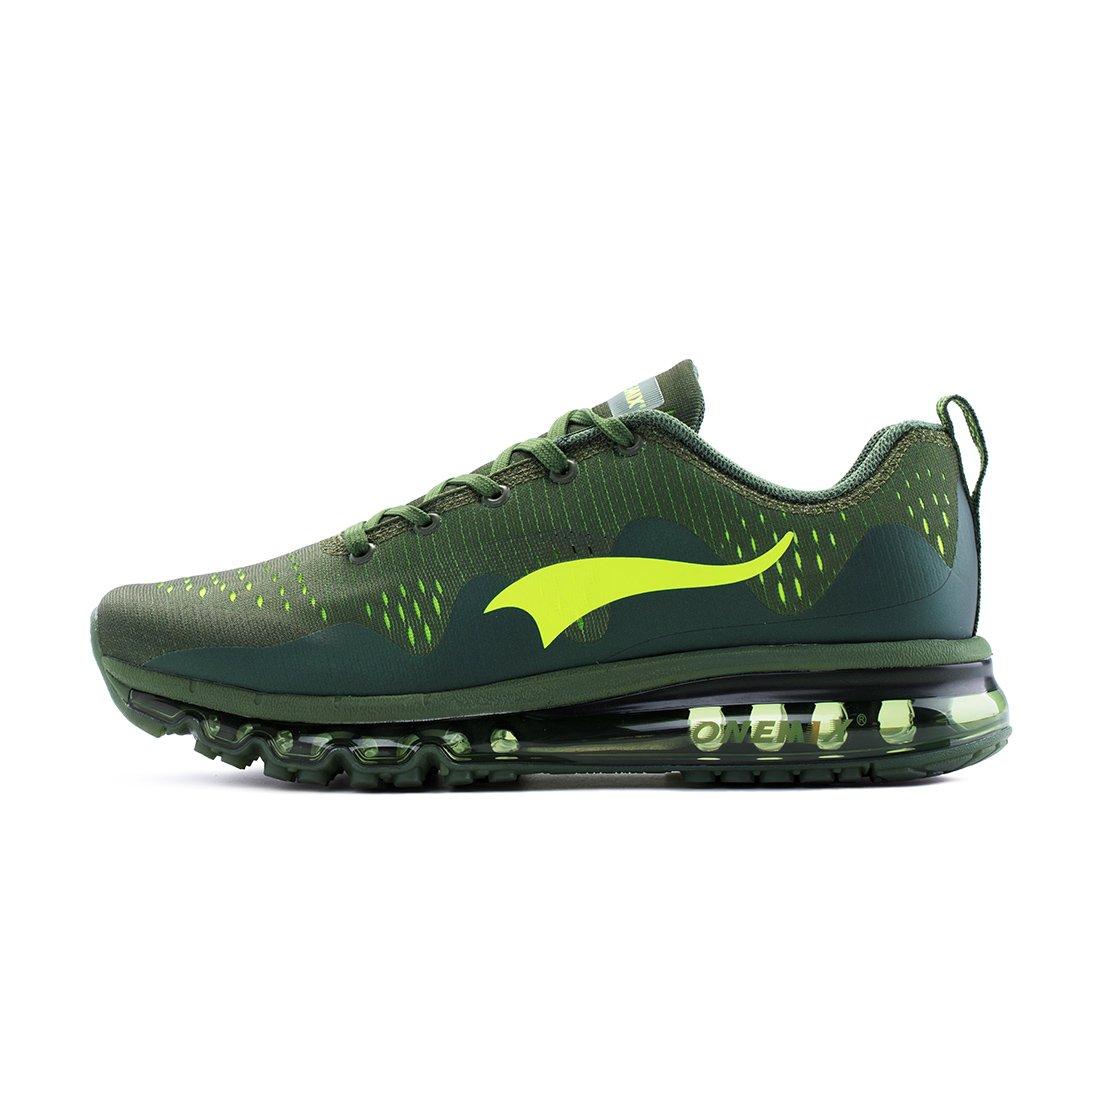 ONEMIX Men's Air Cushion Running Shoes for Women Gym Fitness Sports Mesh Casual Walking Sneakers B07DFYNYG9 Men 8.5(M)US / Women 10(M)US 42EU|Green